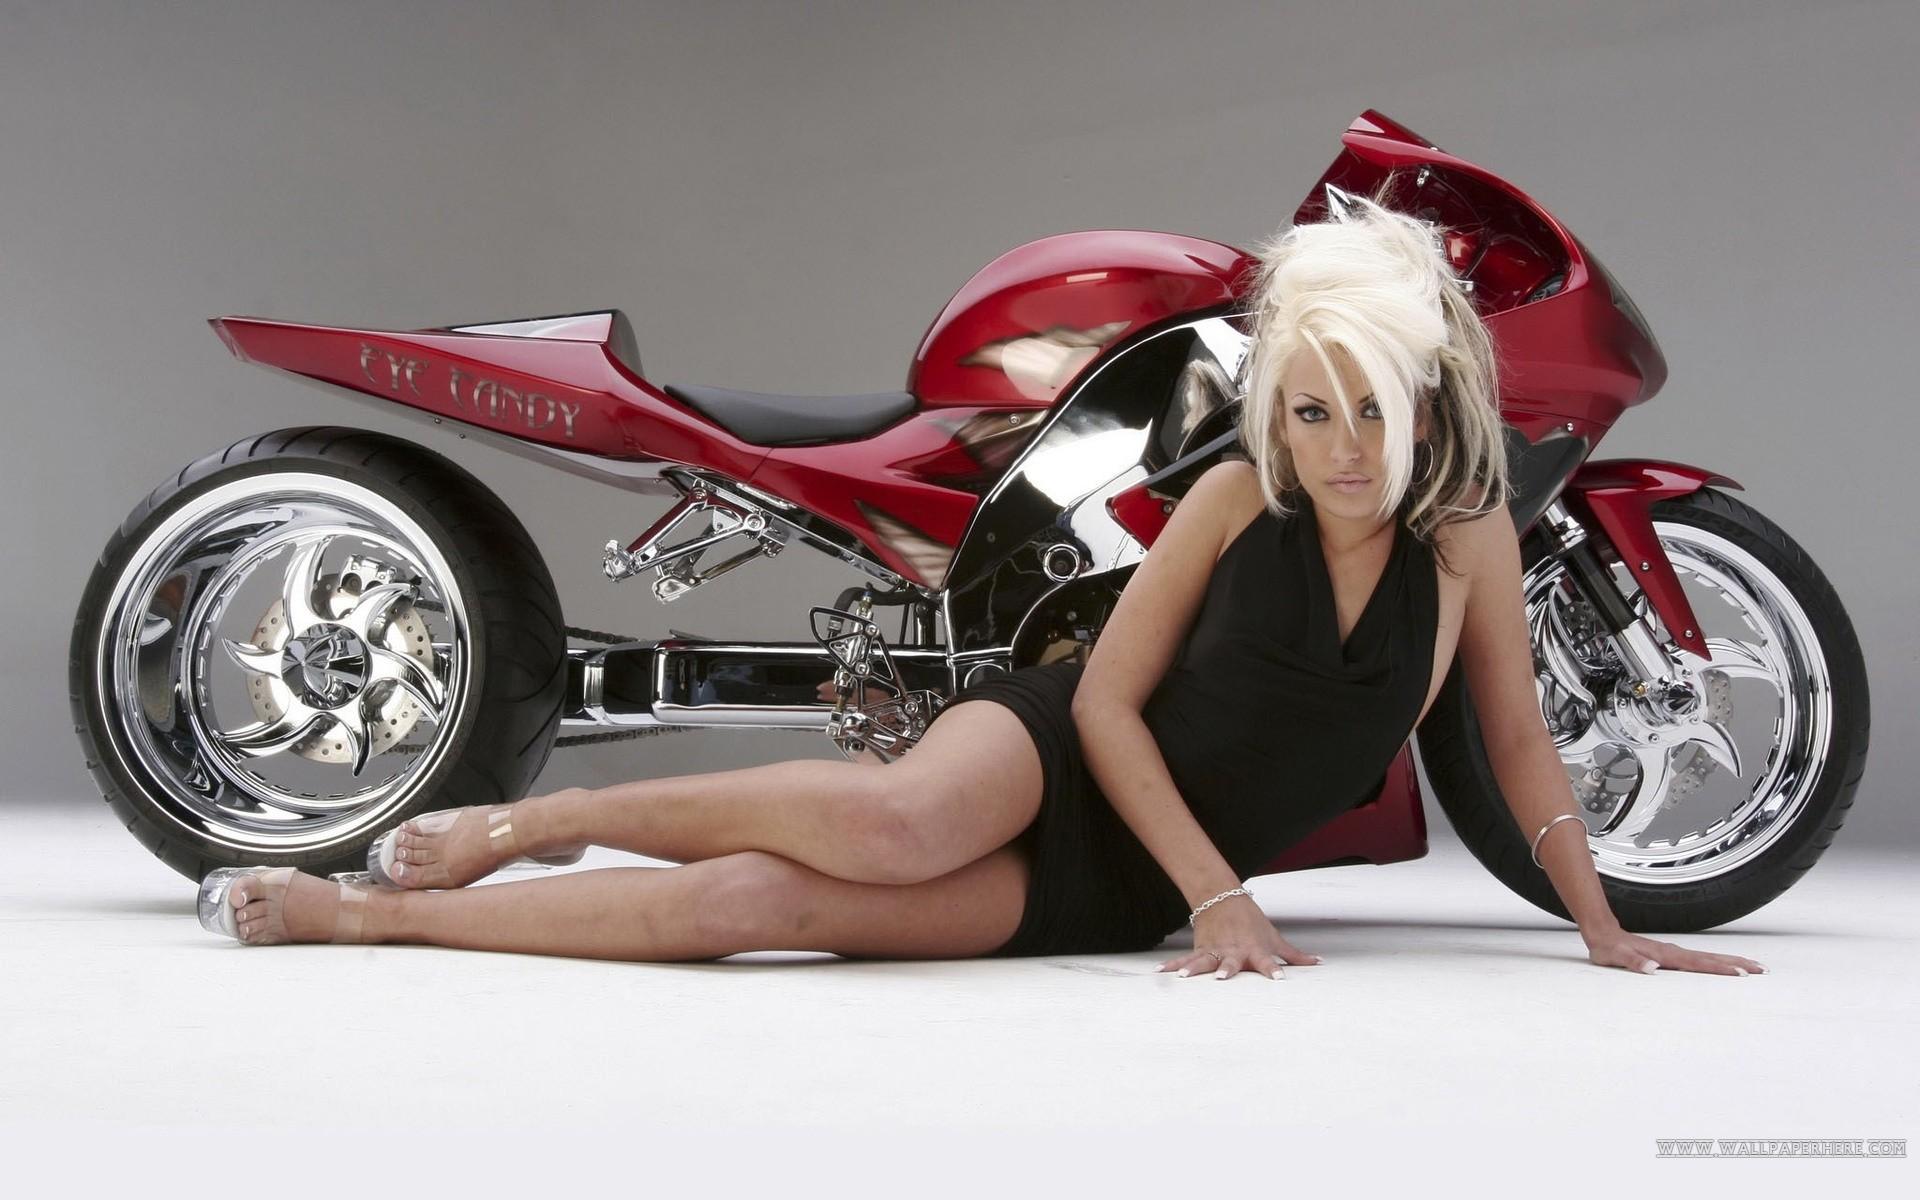 hot women motorcycles wallpaper | hot girls and motorcycle wallpaper